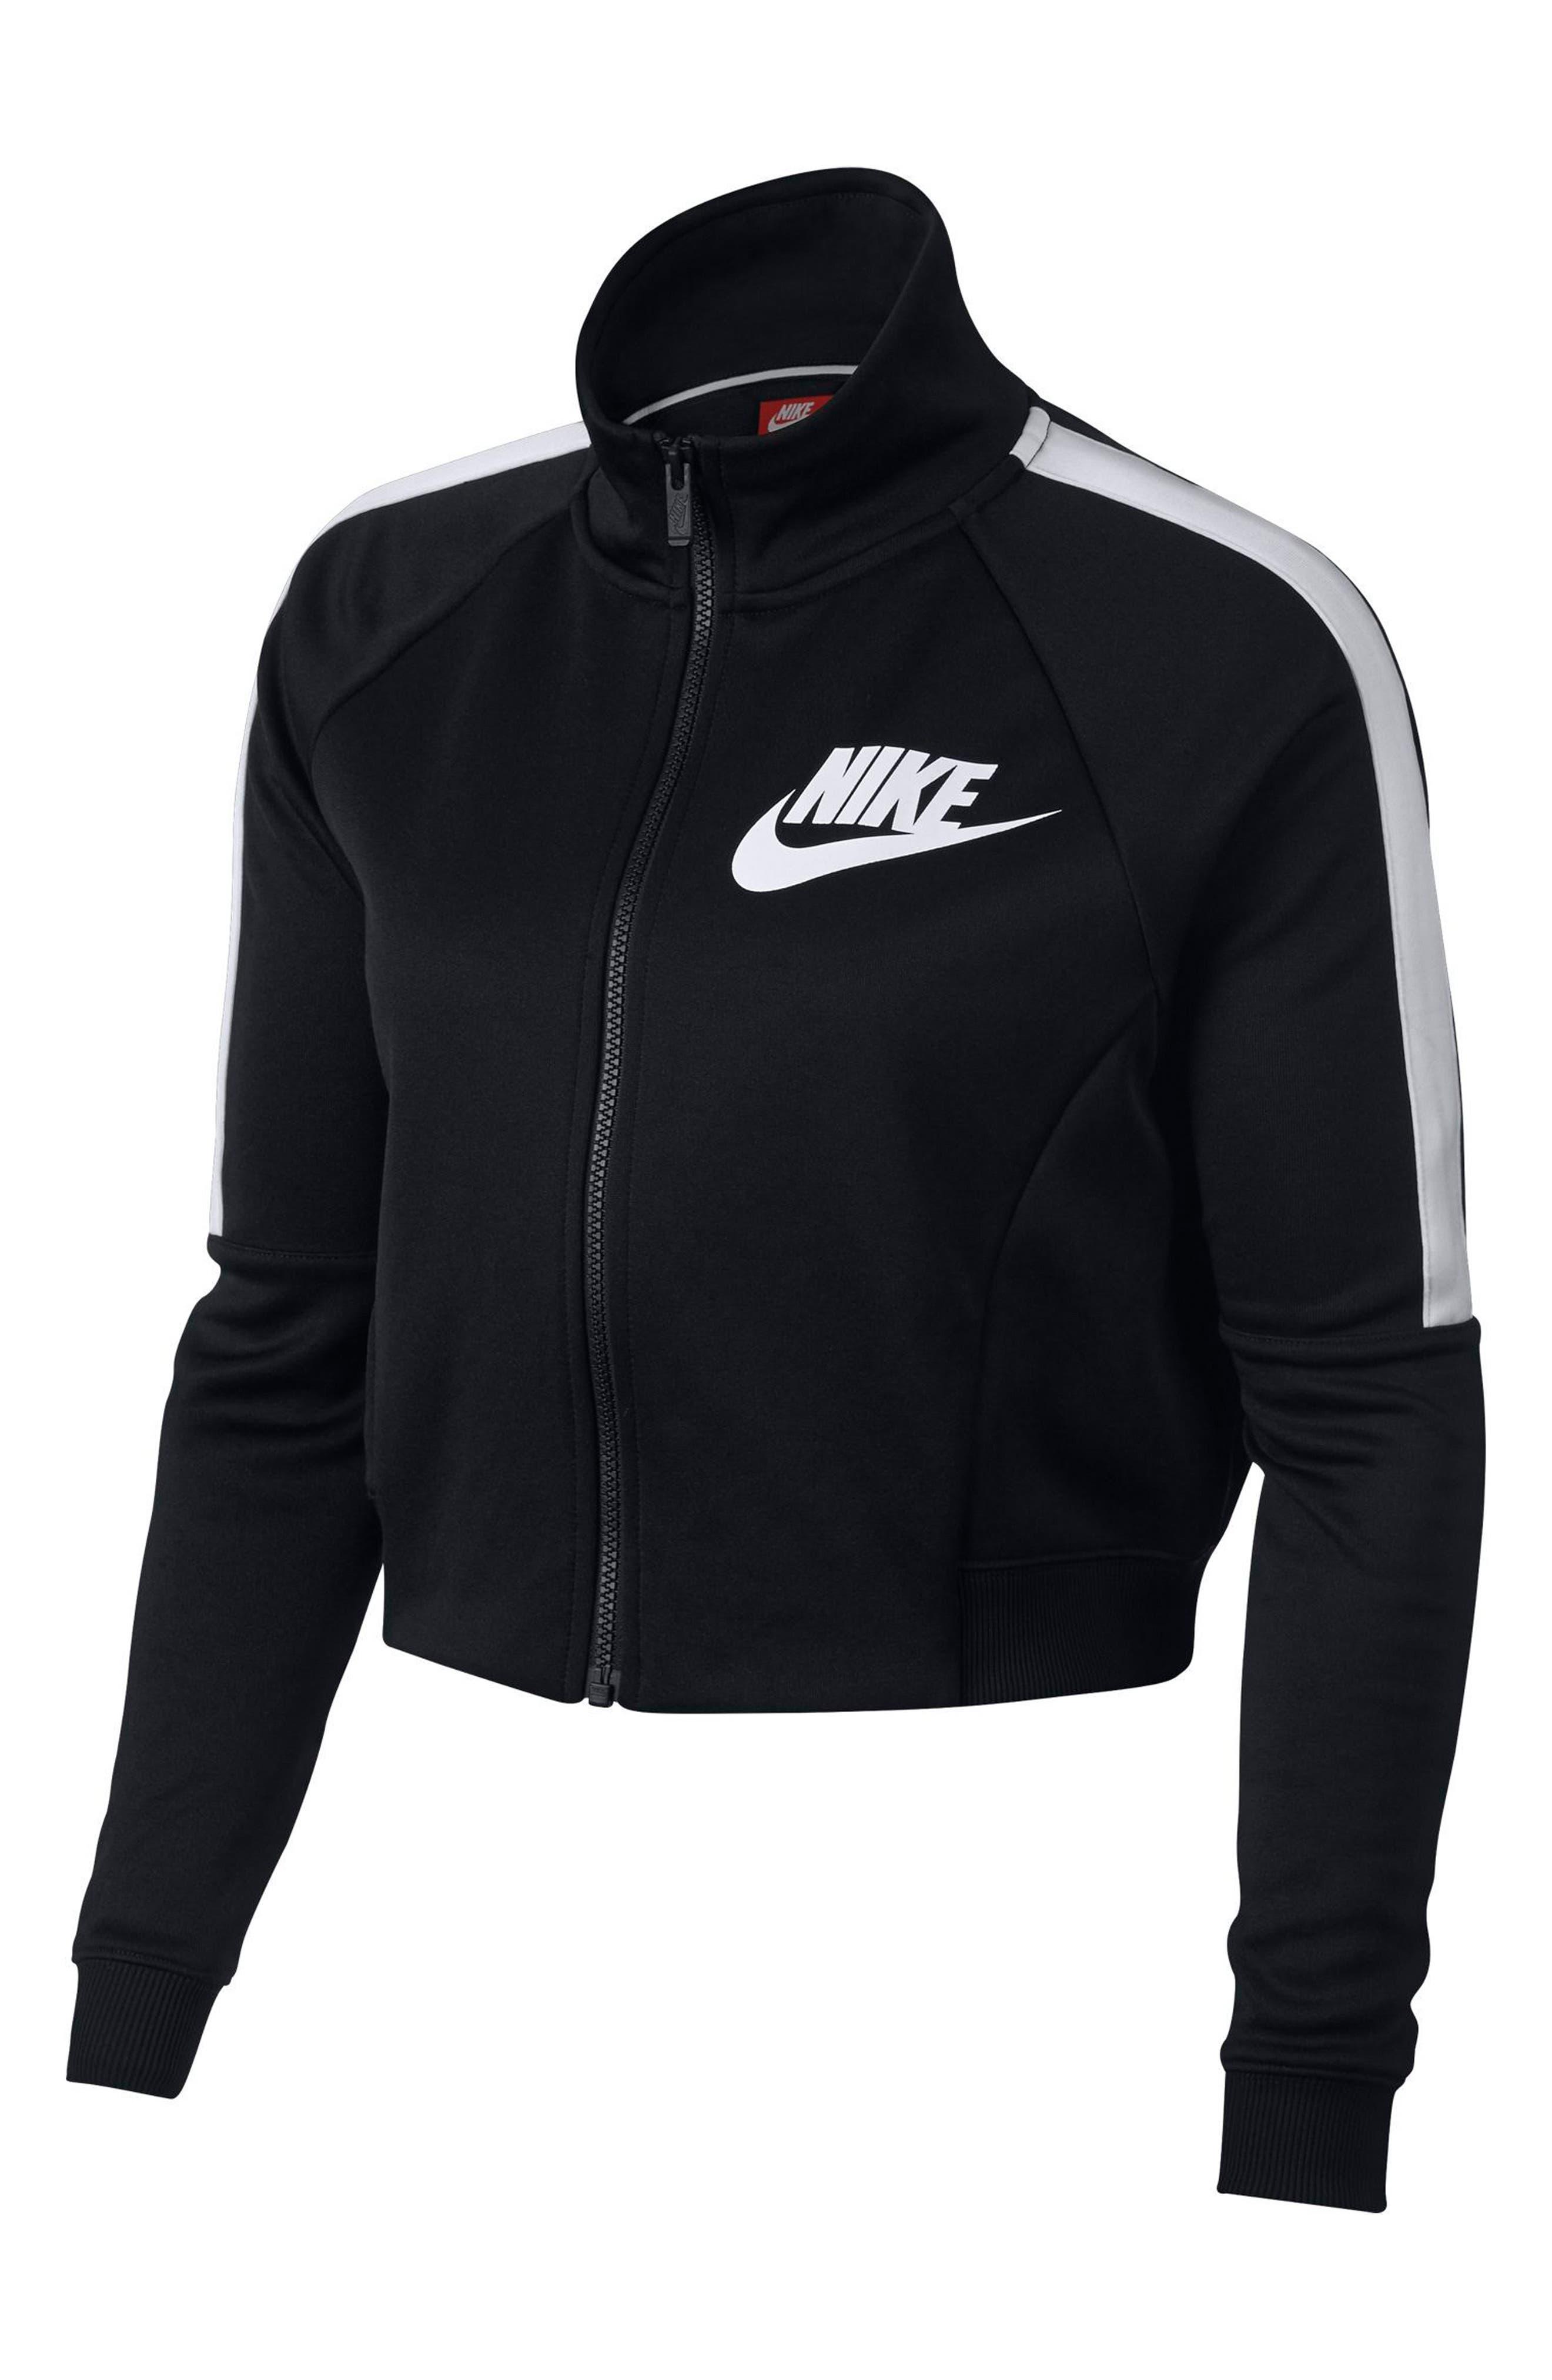 Sportswear N98 Jacket,                             Alternate thumbnail 6, color,